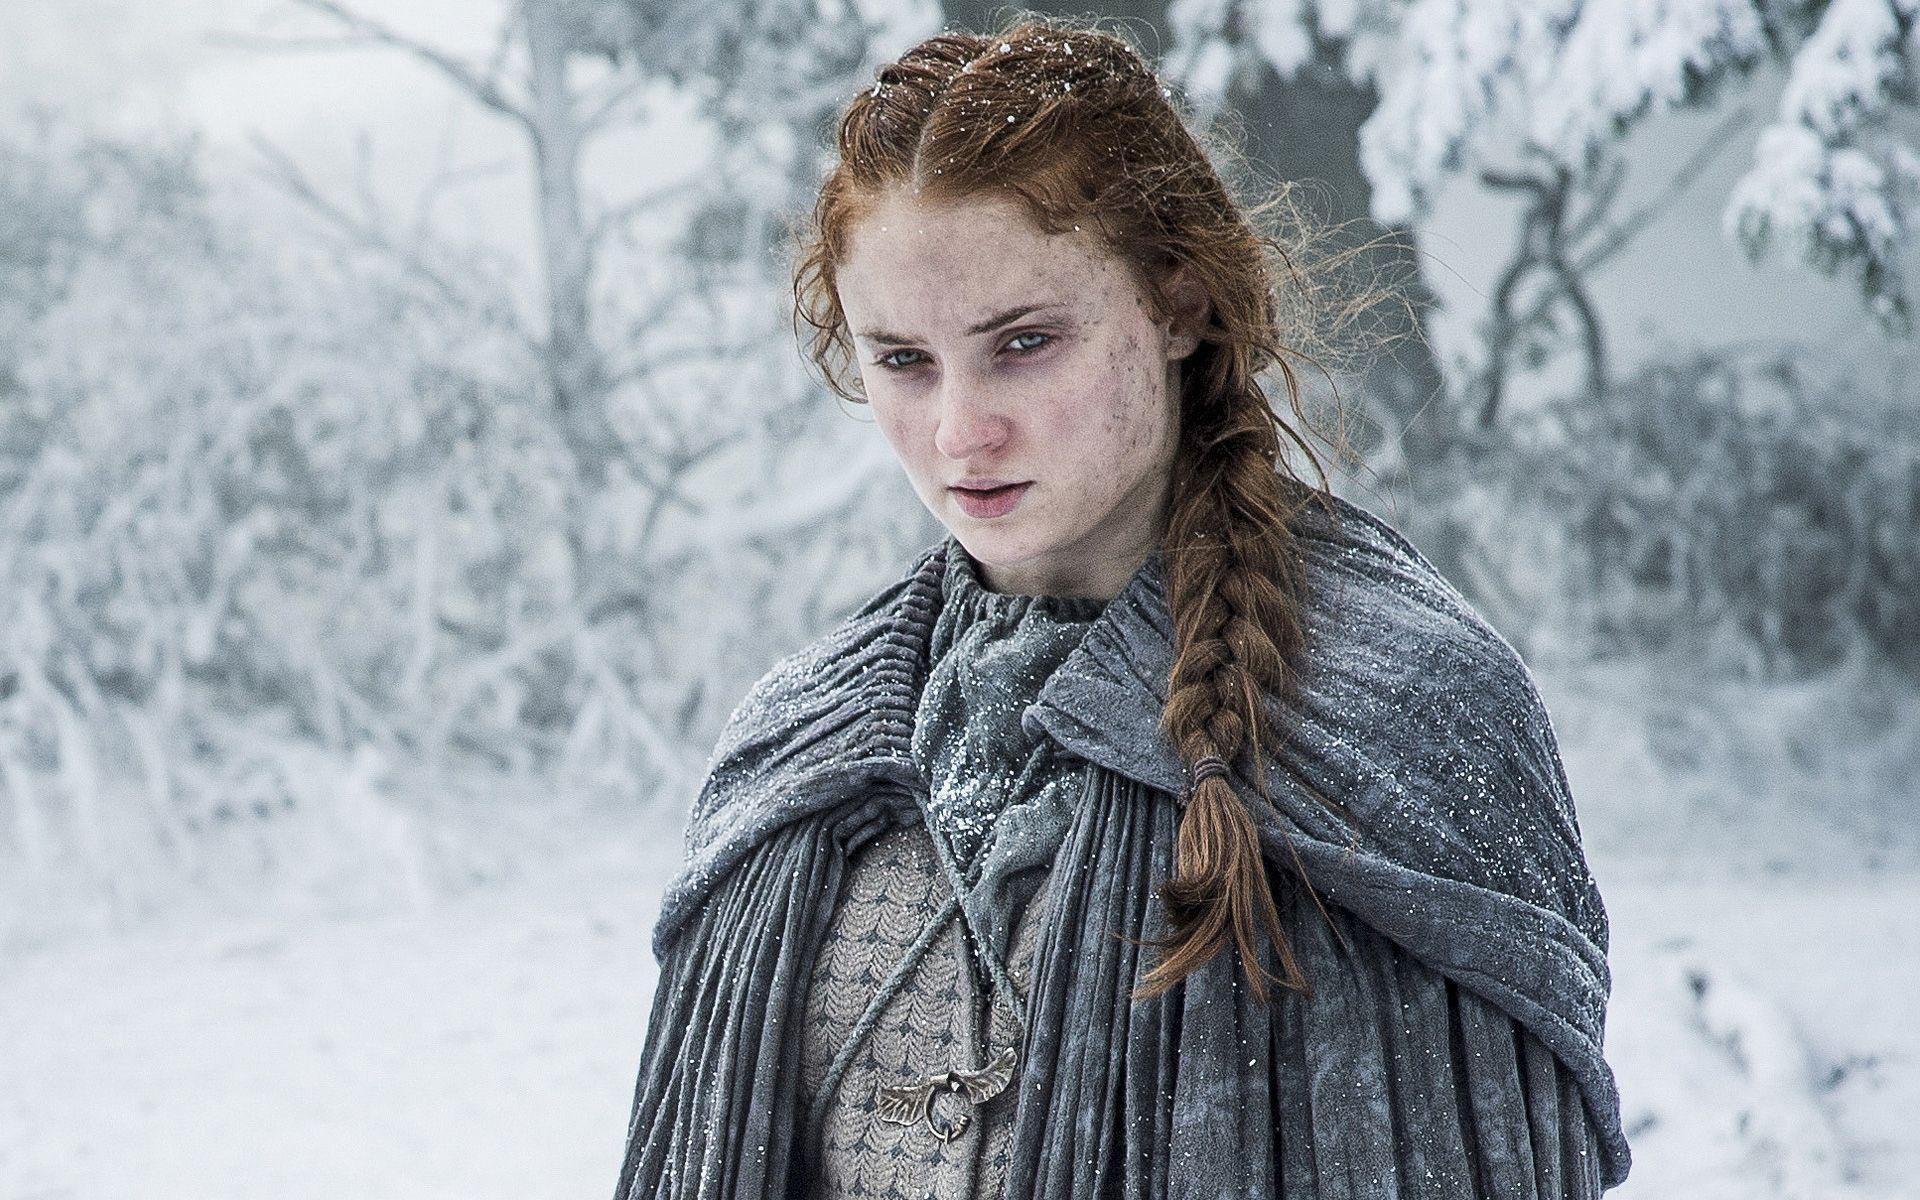 Sophie Turner Sansa Stark Game Of Thrones Season 6 Wallpapers